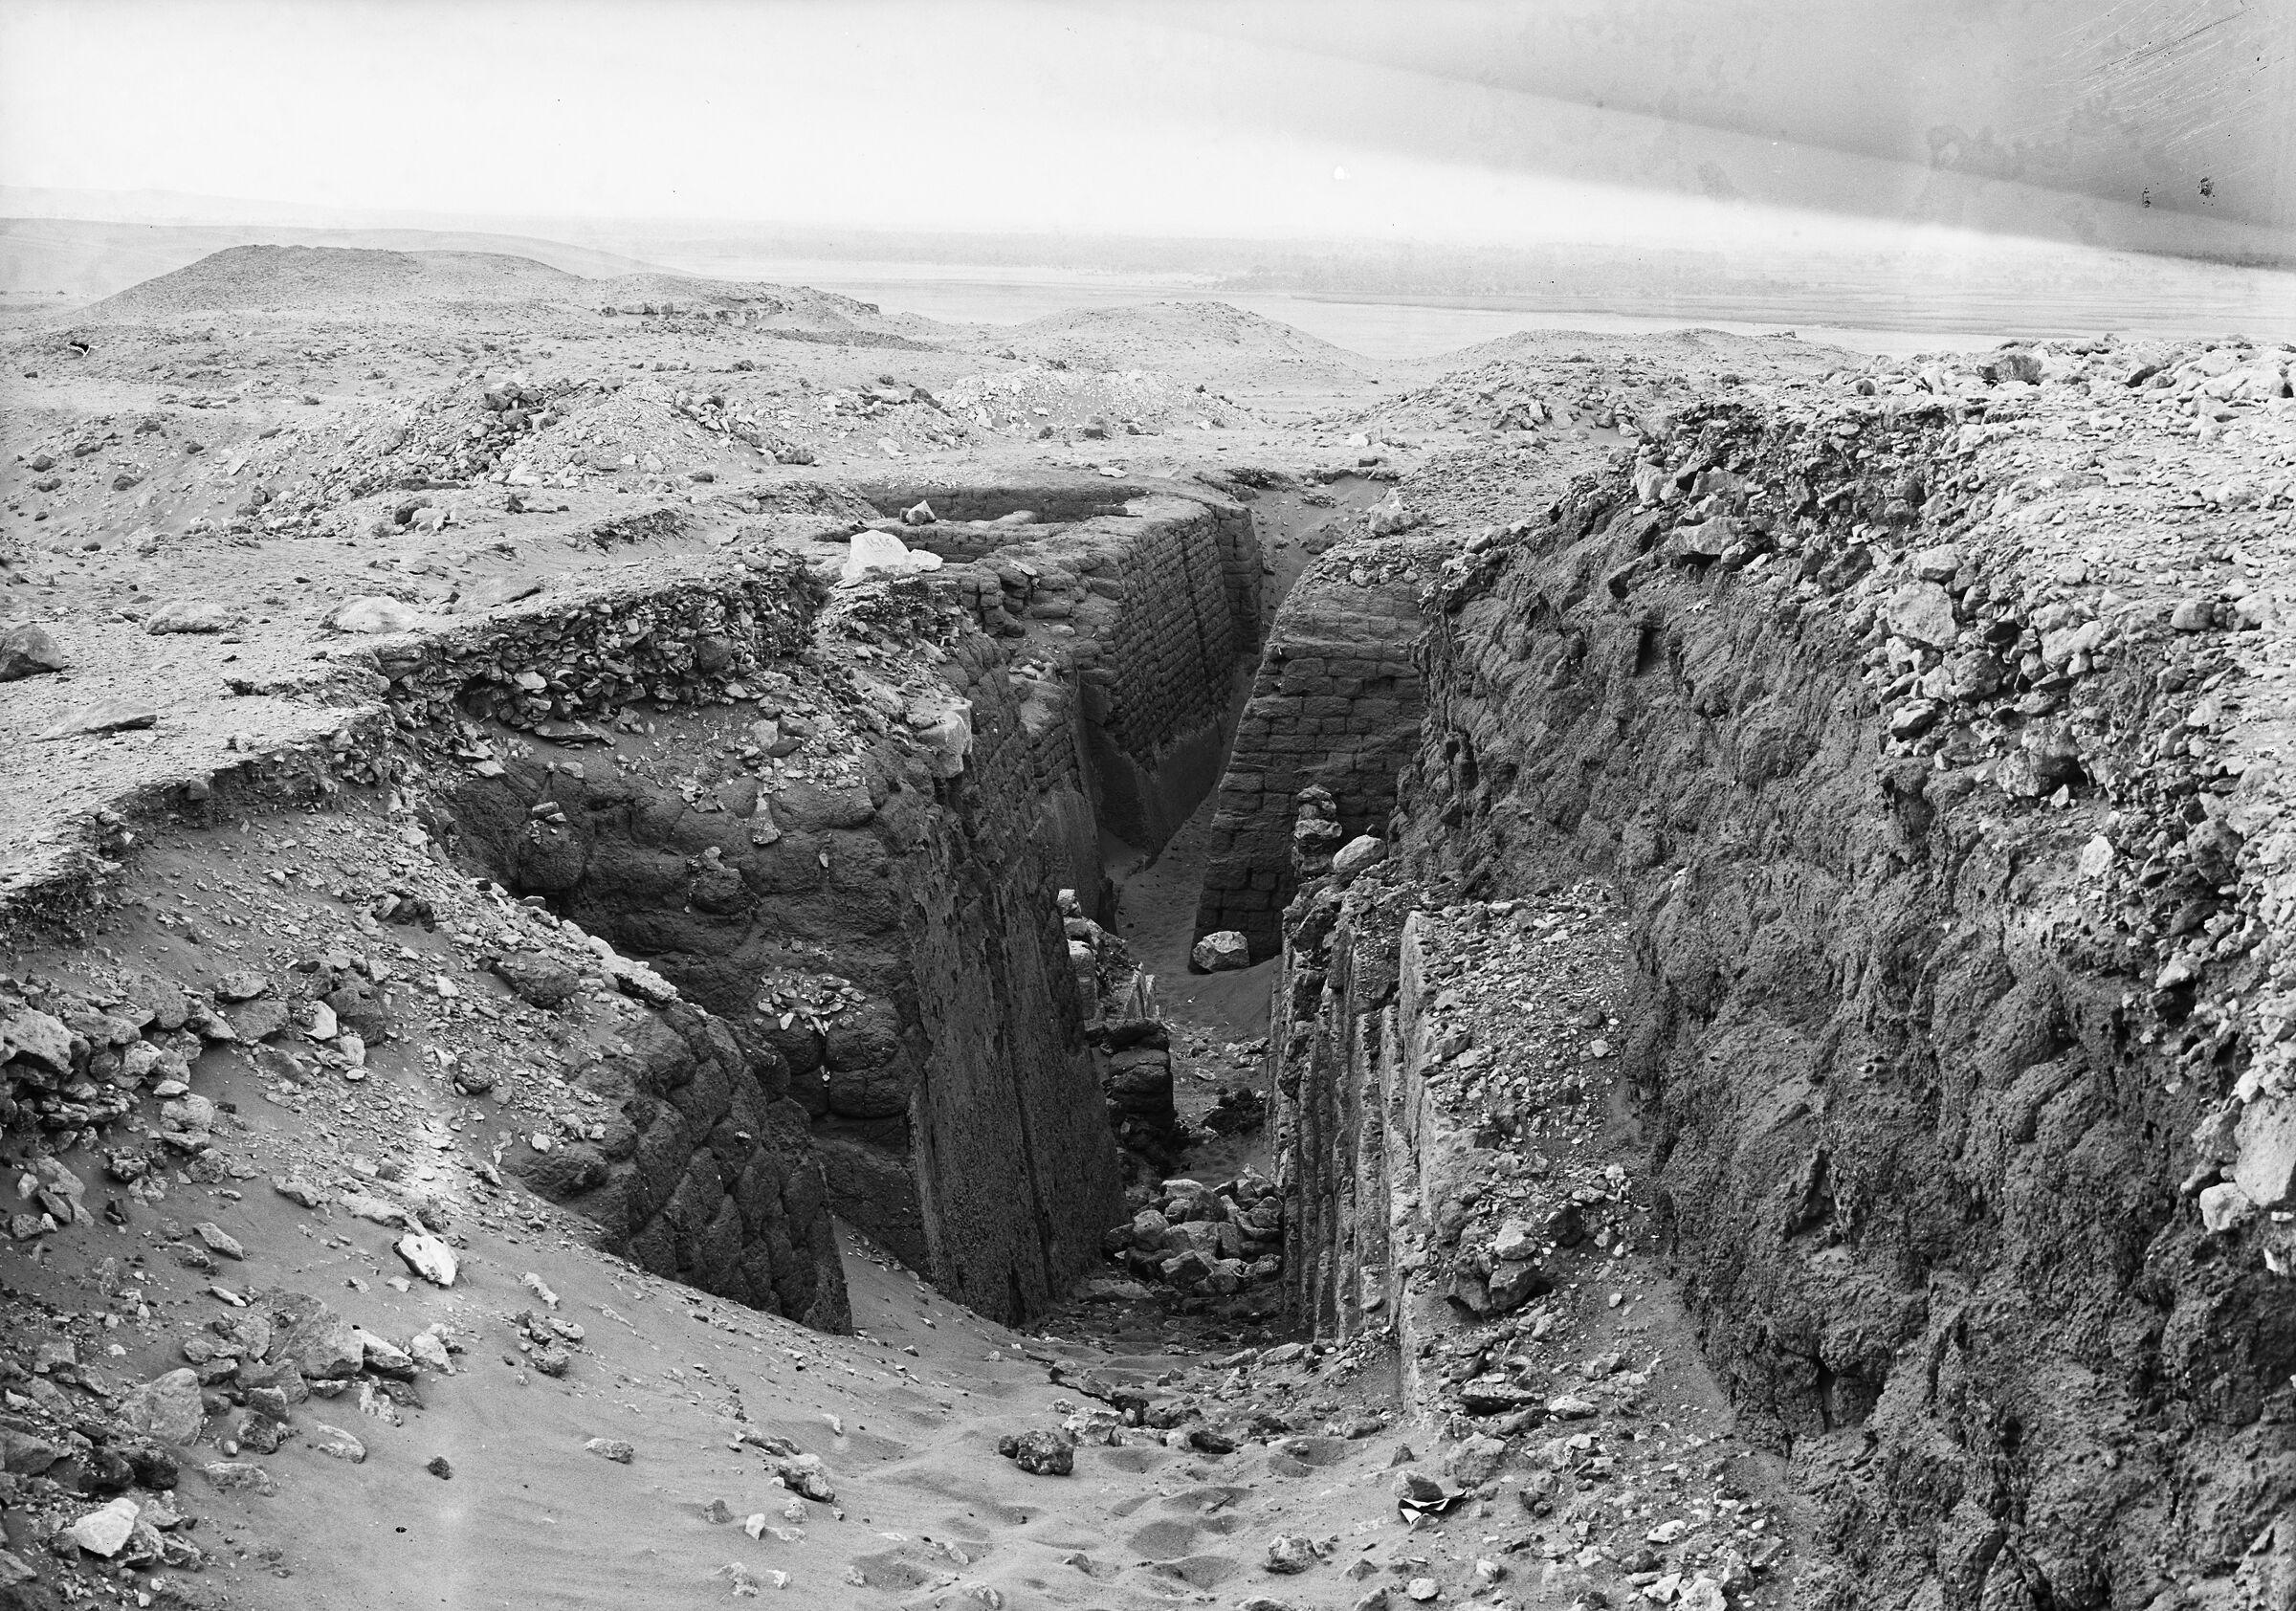 Western Cemetery: Site: Giza; View: G 1407, G 1457, G 1412, G 1452+1453, G 1451